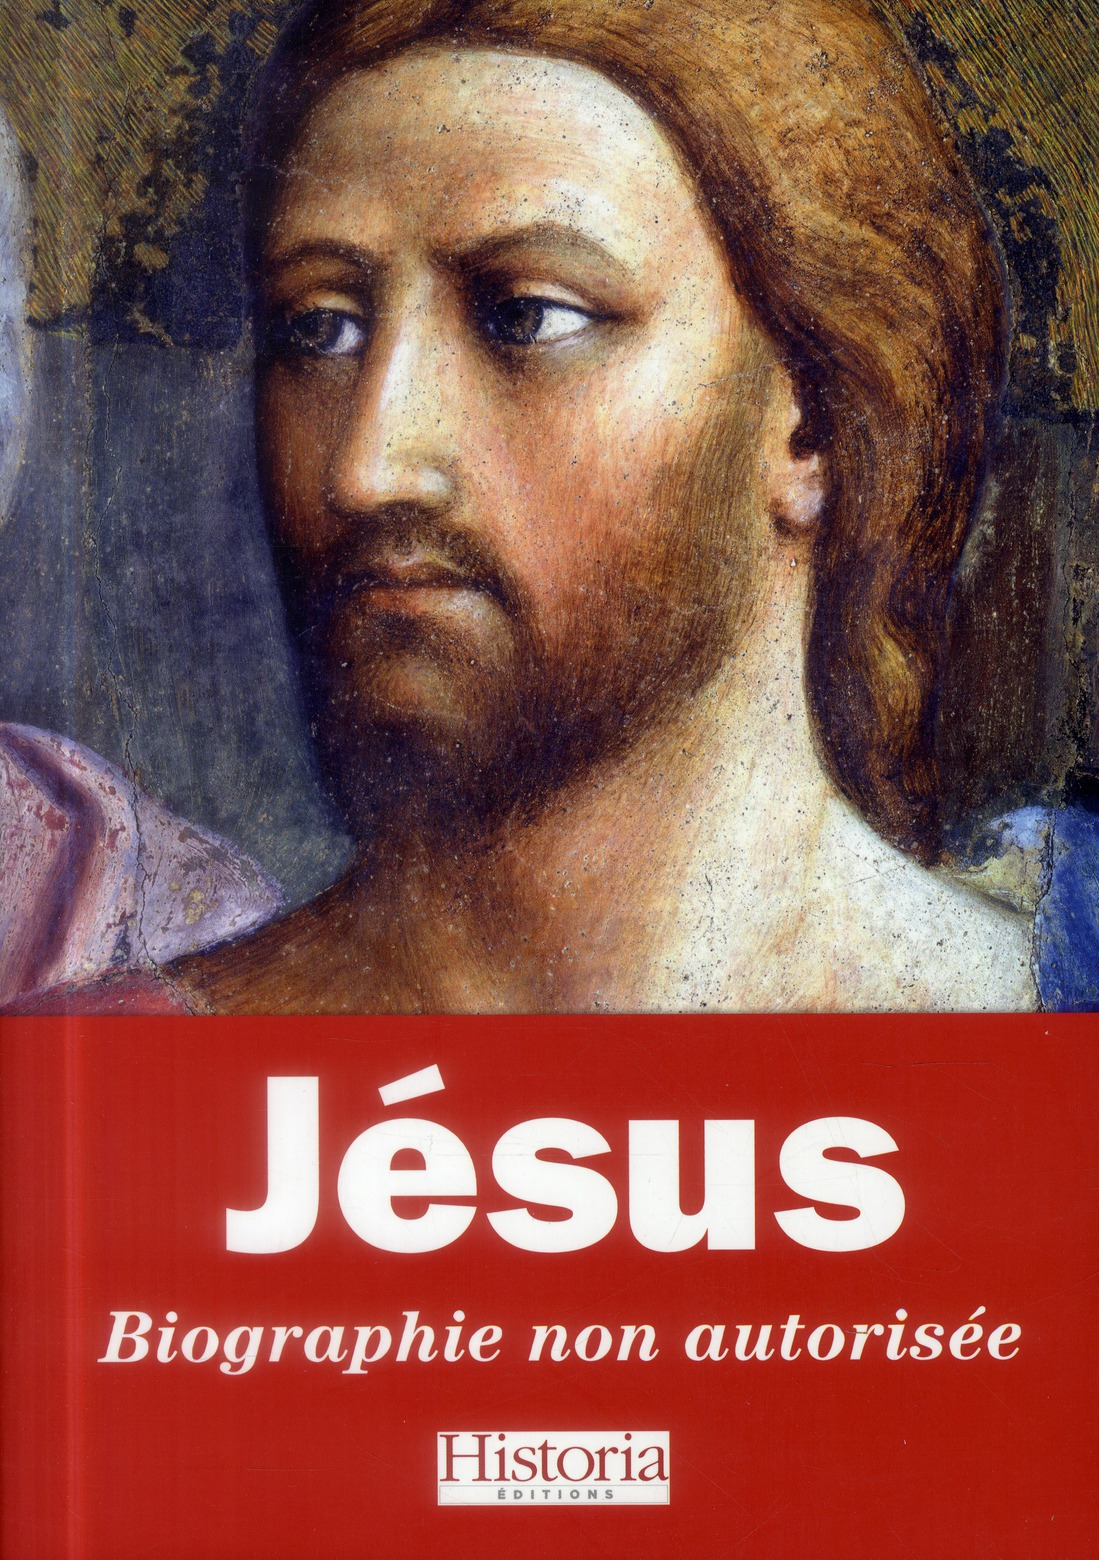 JESUS - BIOGRAPHIE NON AUTORISEE